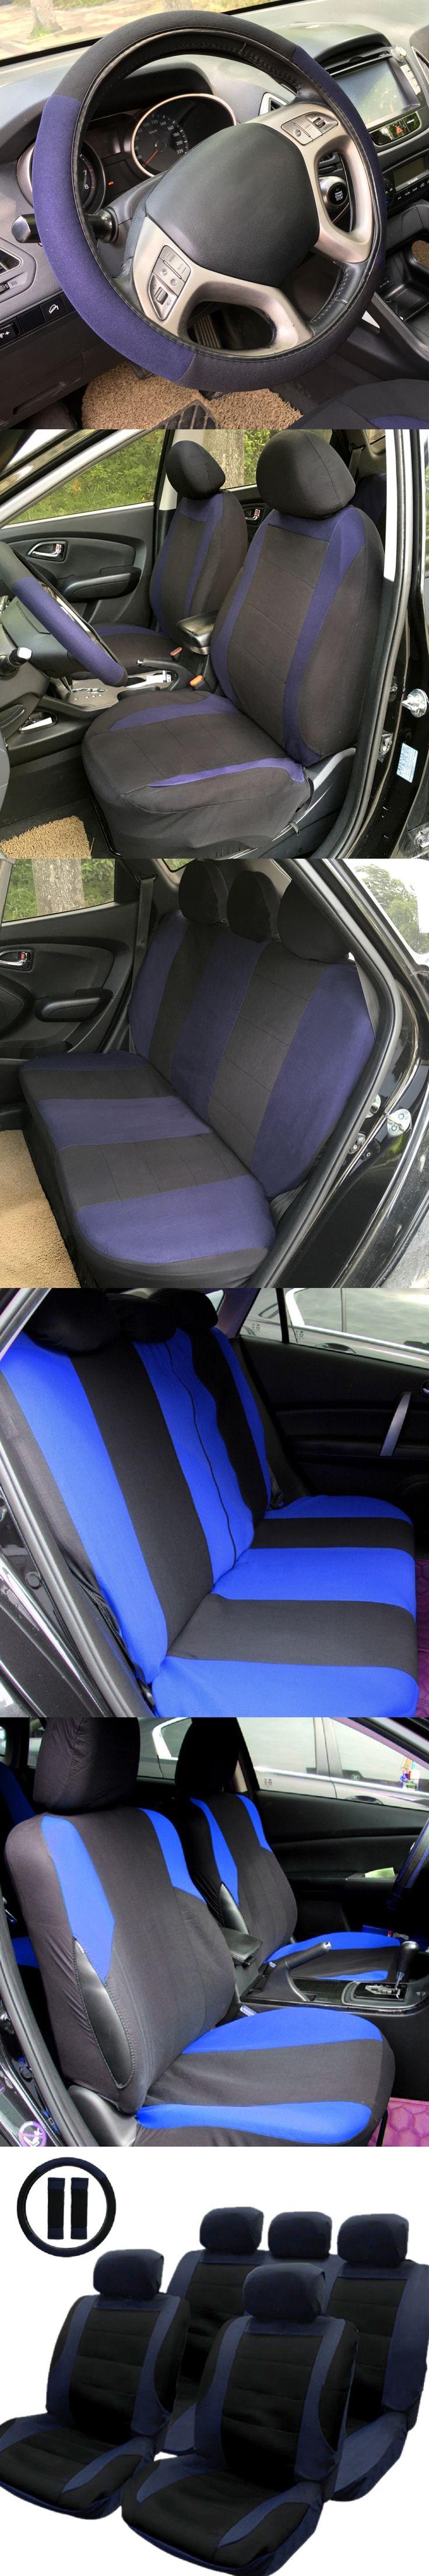 Tirol T21806b New Car Seat Cover Black Blue 14pcs Set Front Rear Covers